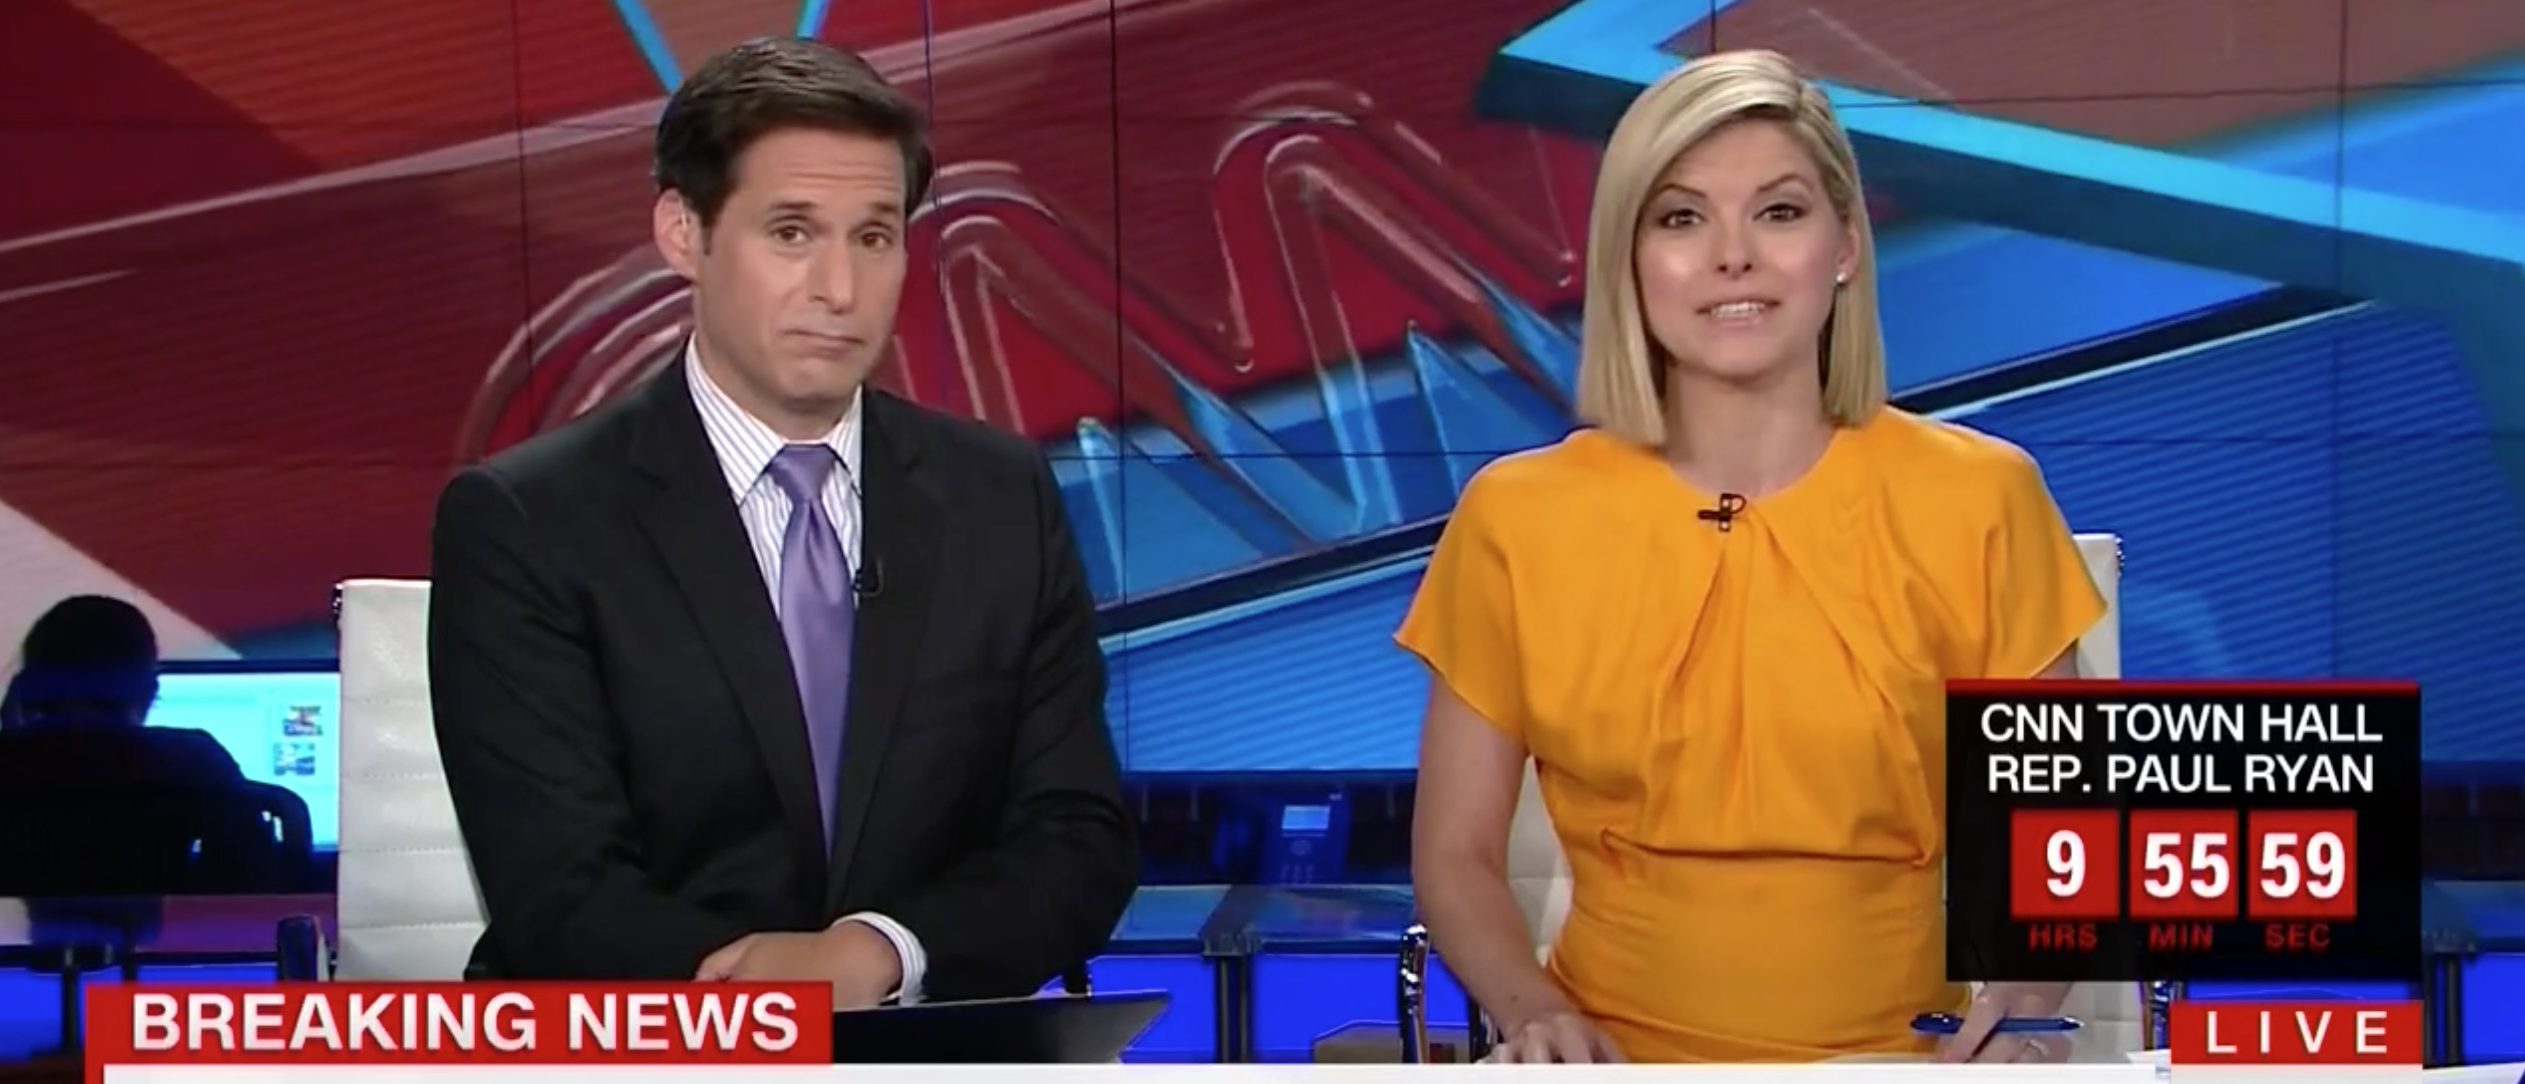 John Berman, Kate Bolduan, Screen Grab CNN, 7-12-2016